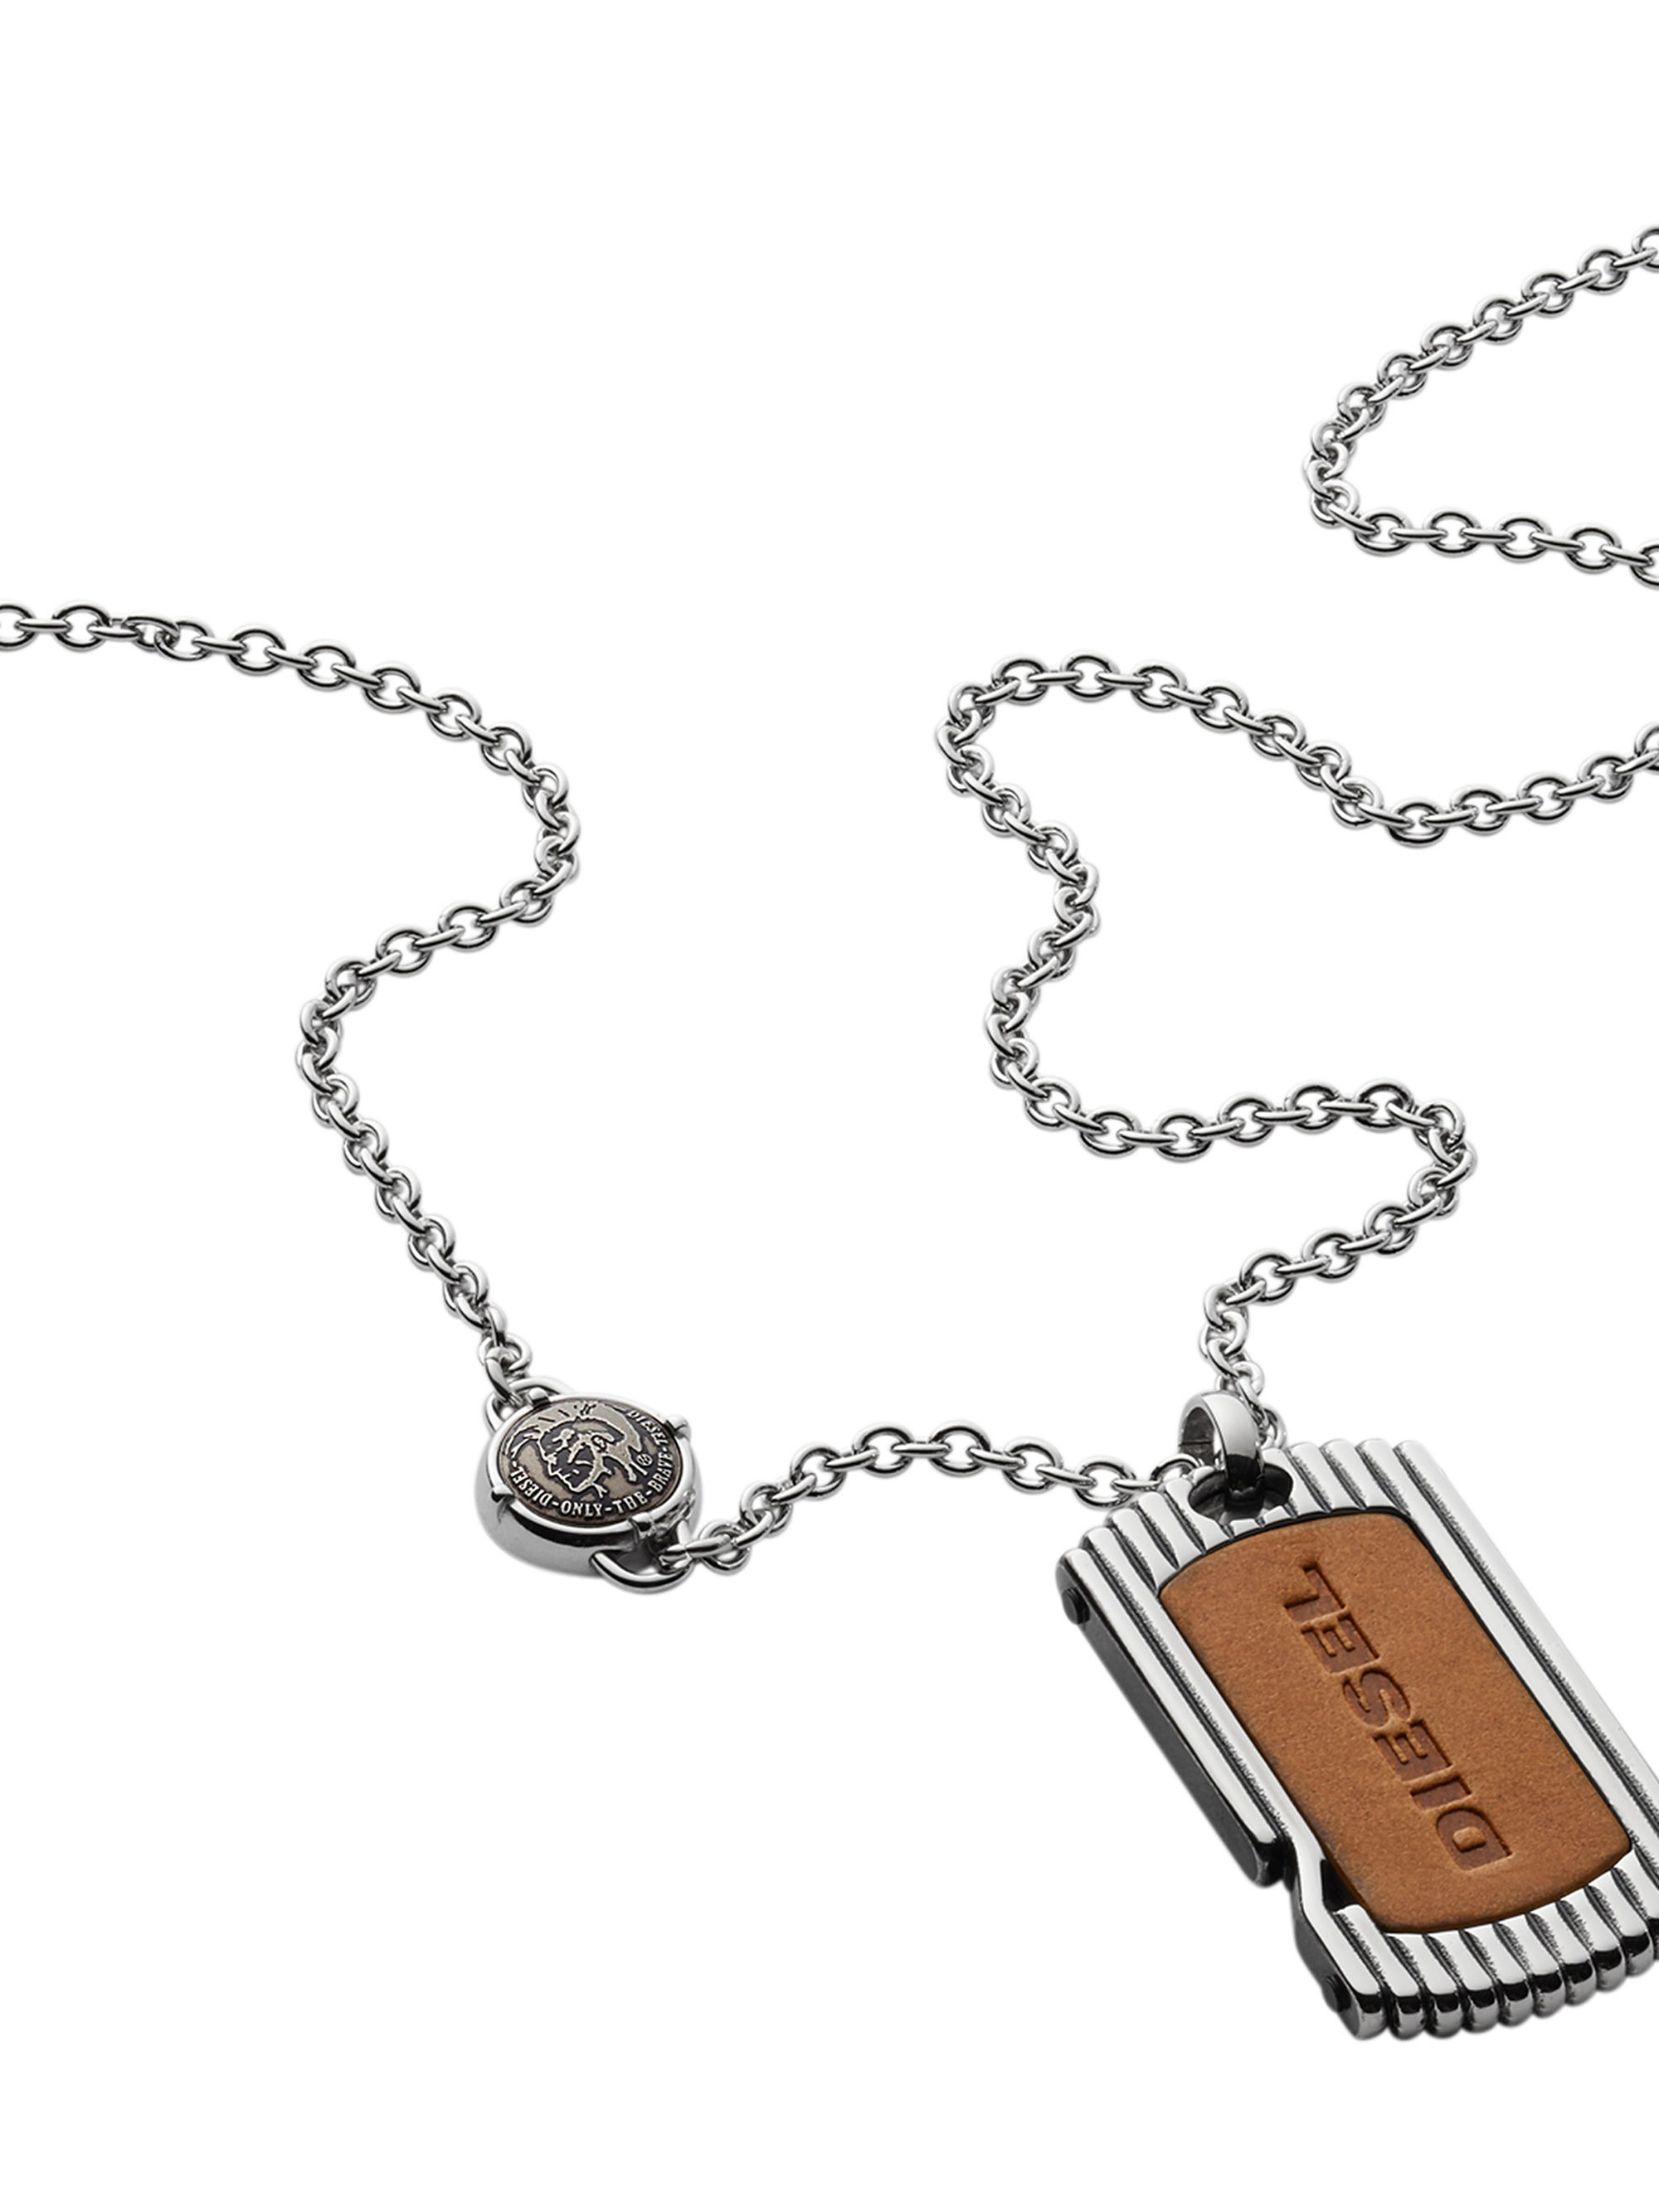 Diesel Necklace Dx0985 In Metallic For Men Lyst